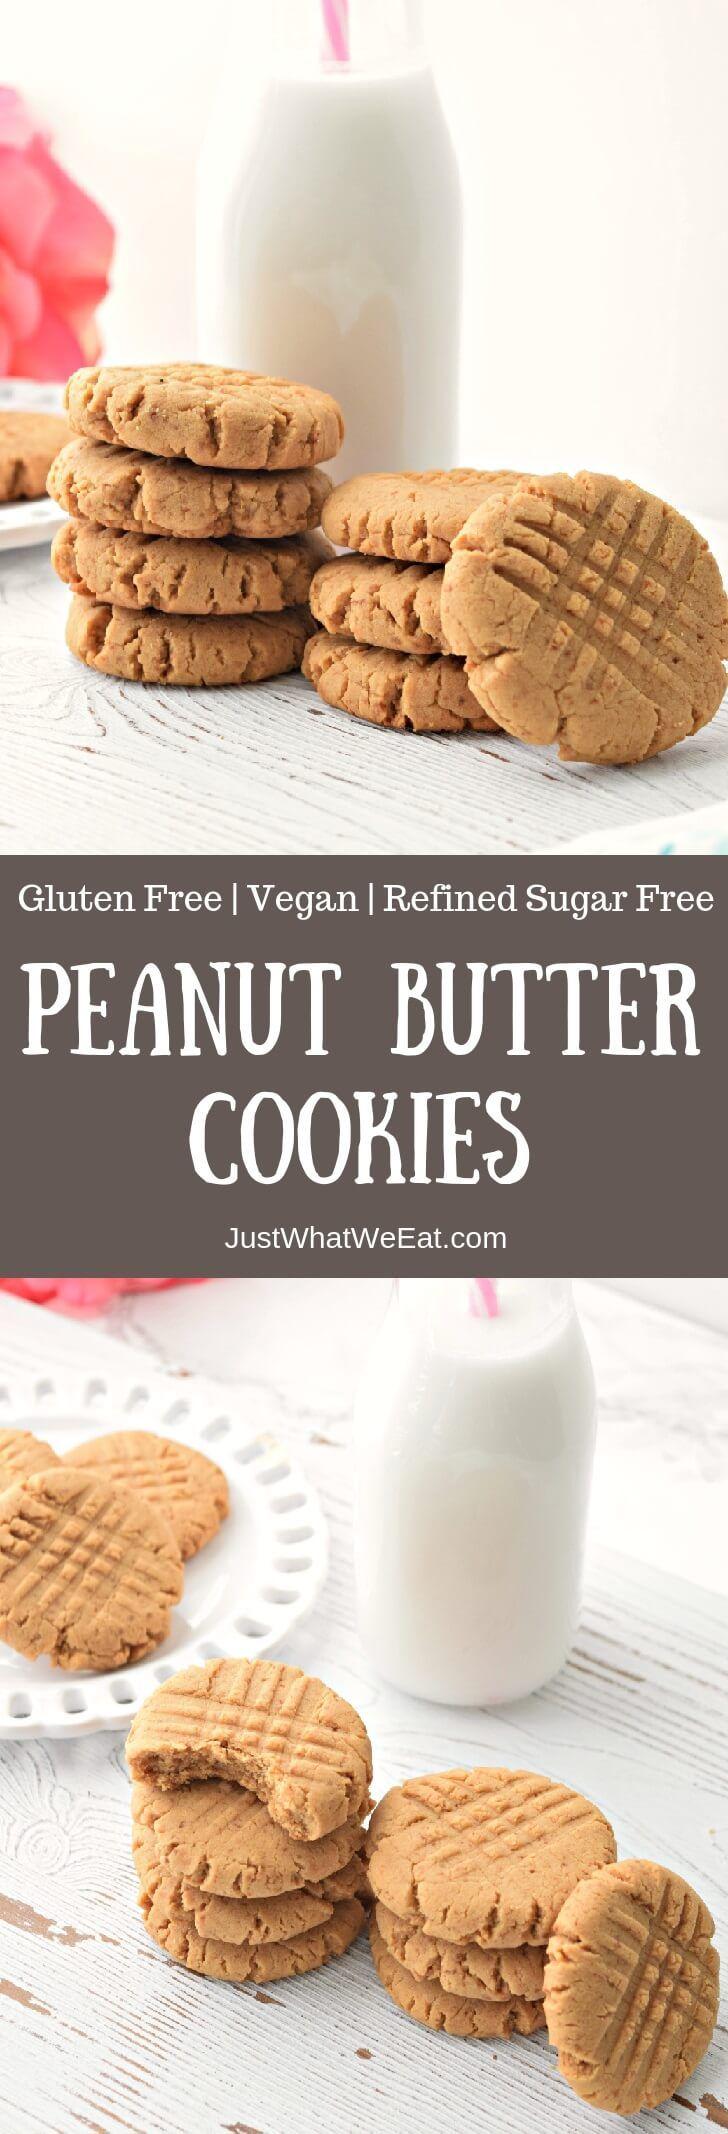 Peanut Butter Cookies - Gluten Free, Vegan, & Refined Sugar Free #cookies